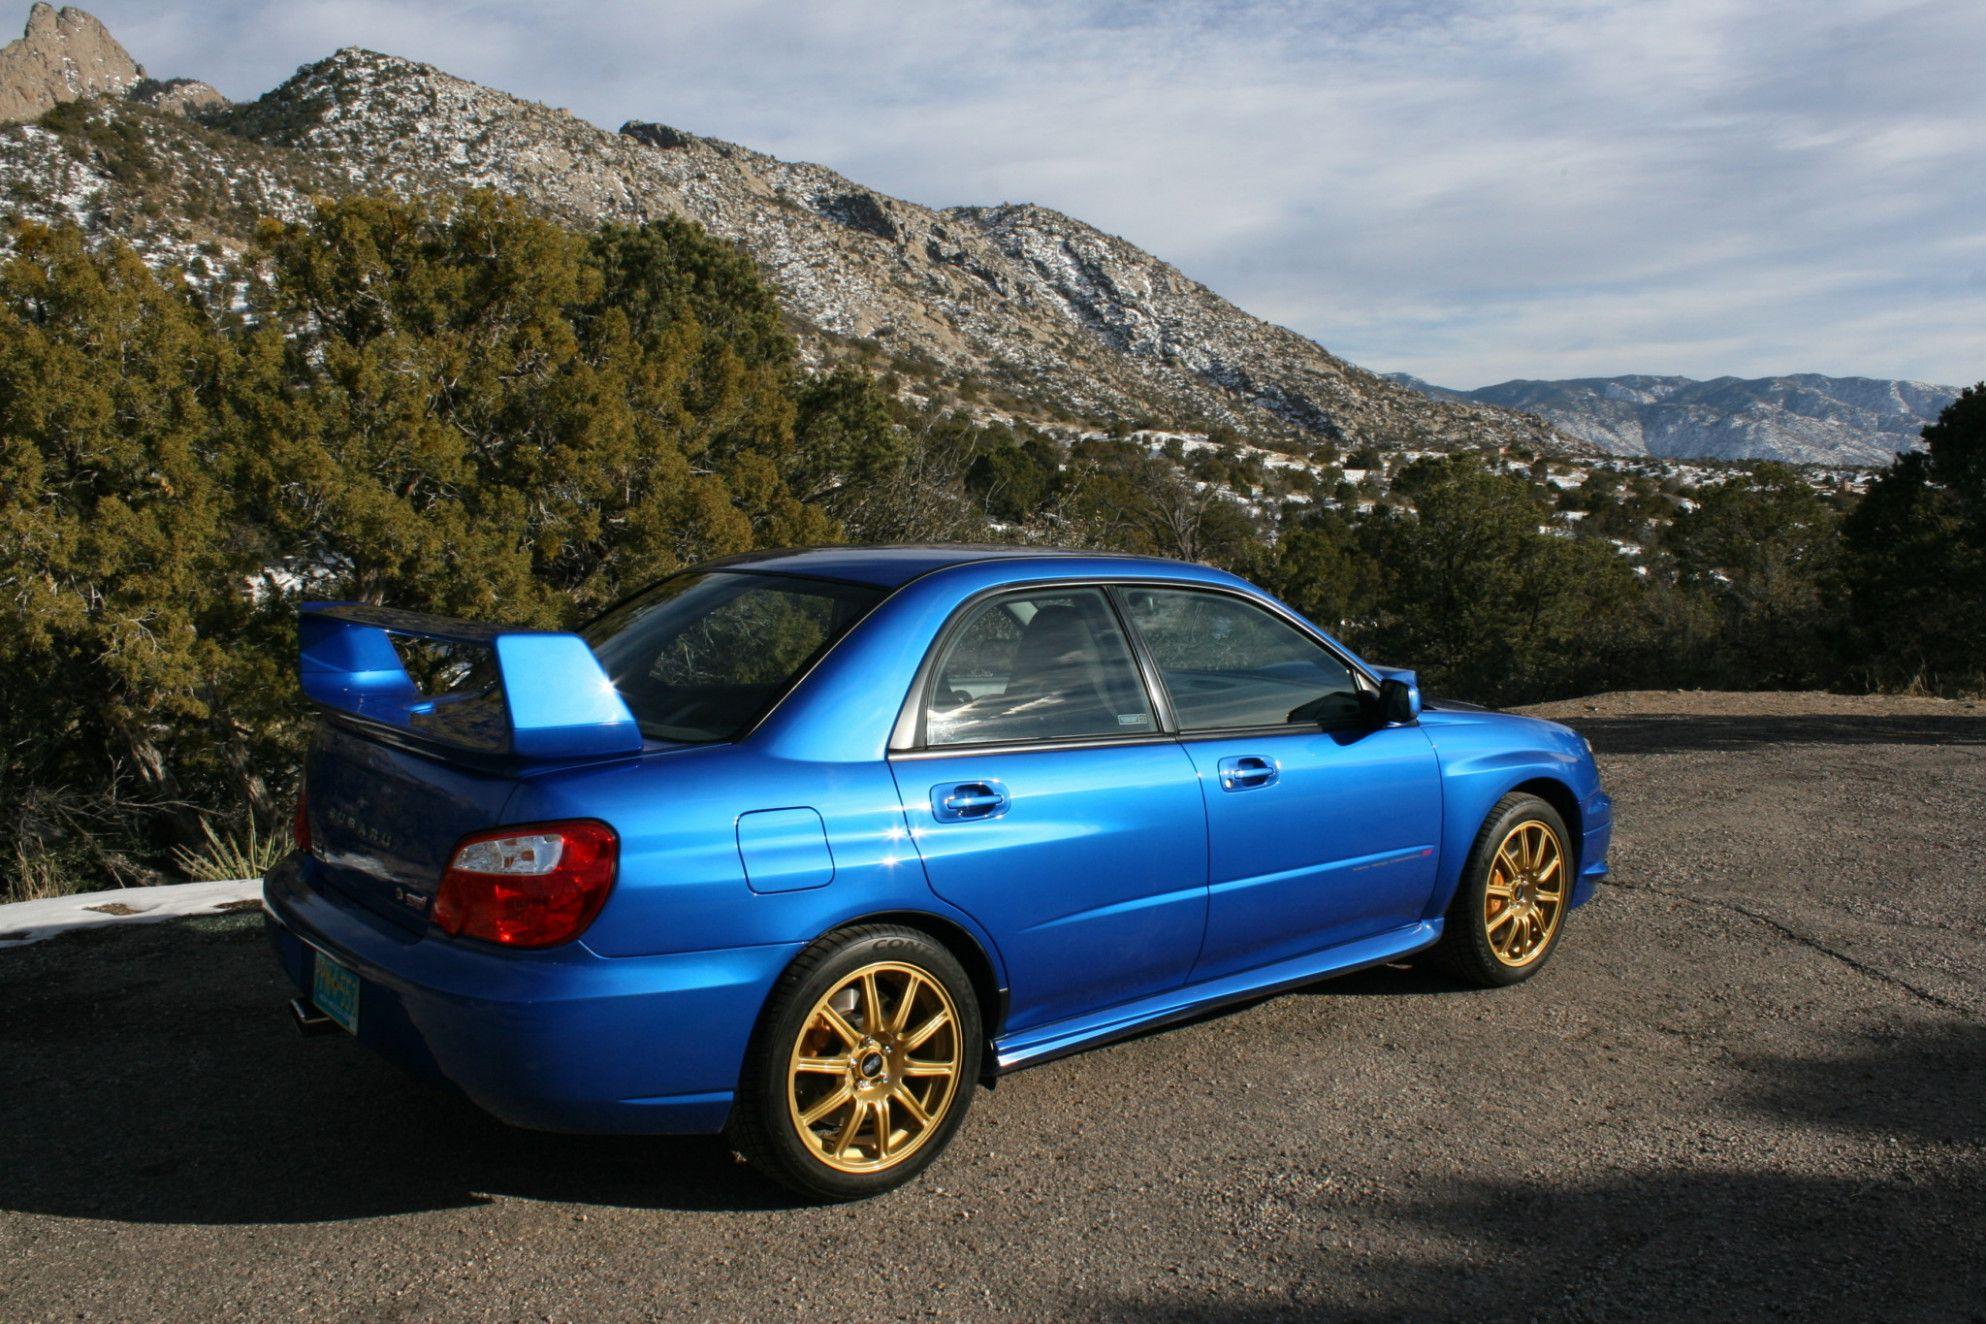 2004 Subaru Wrx Sti For Sale Craigslist Rumor 2004 Subaru Wrx Subaru Wrx Sti Wrx